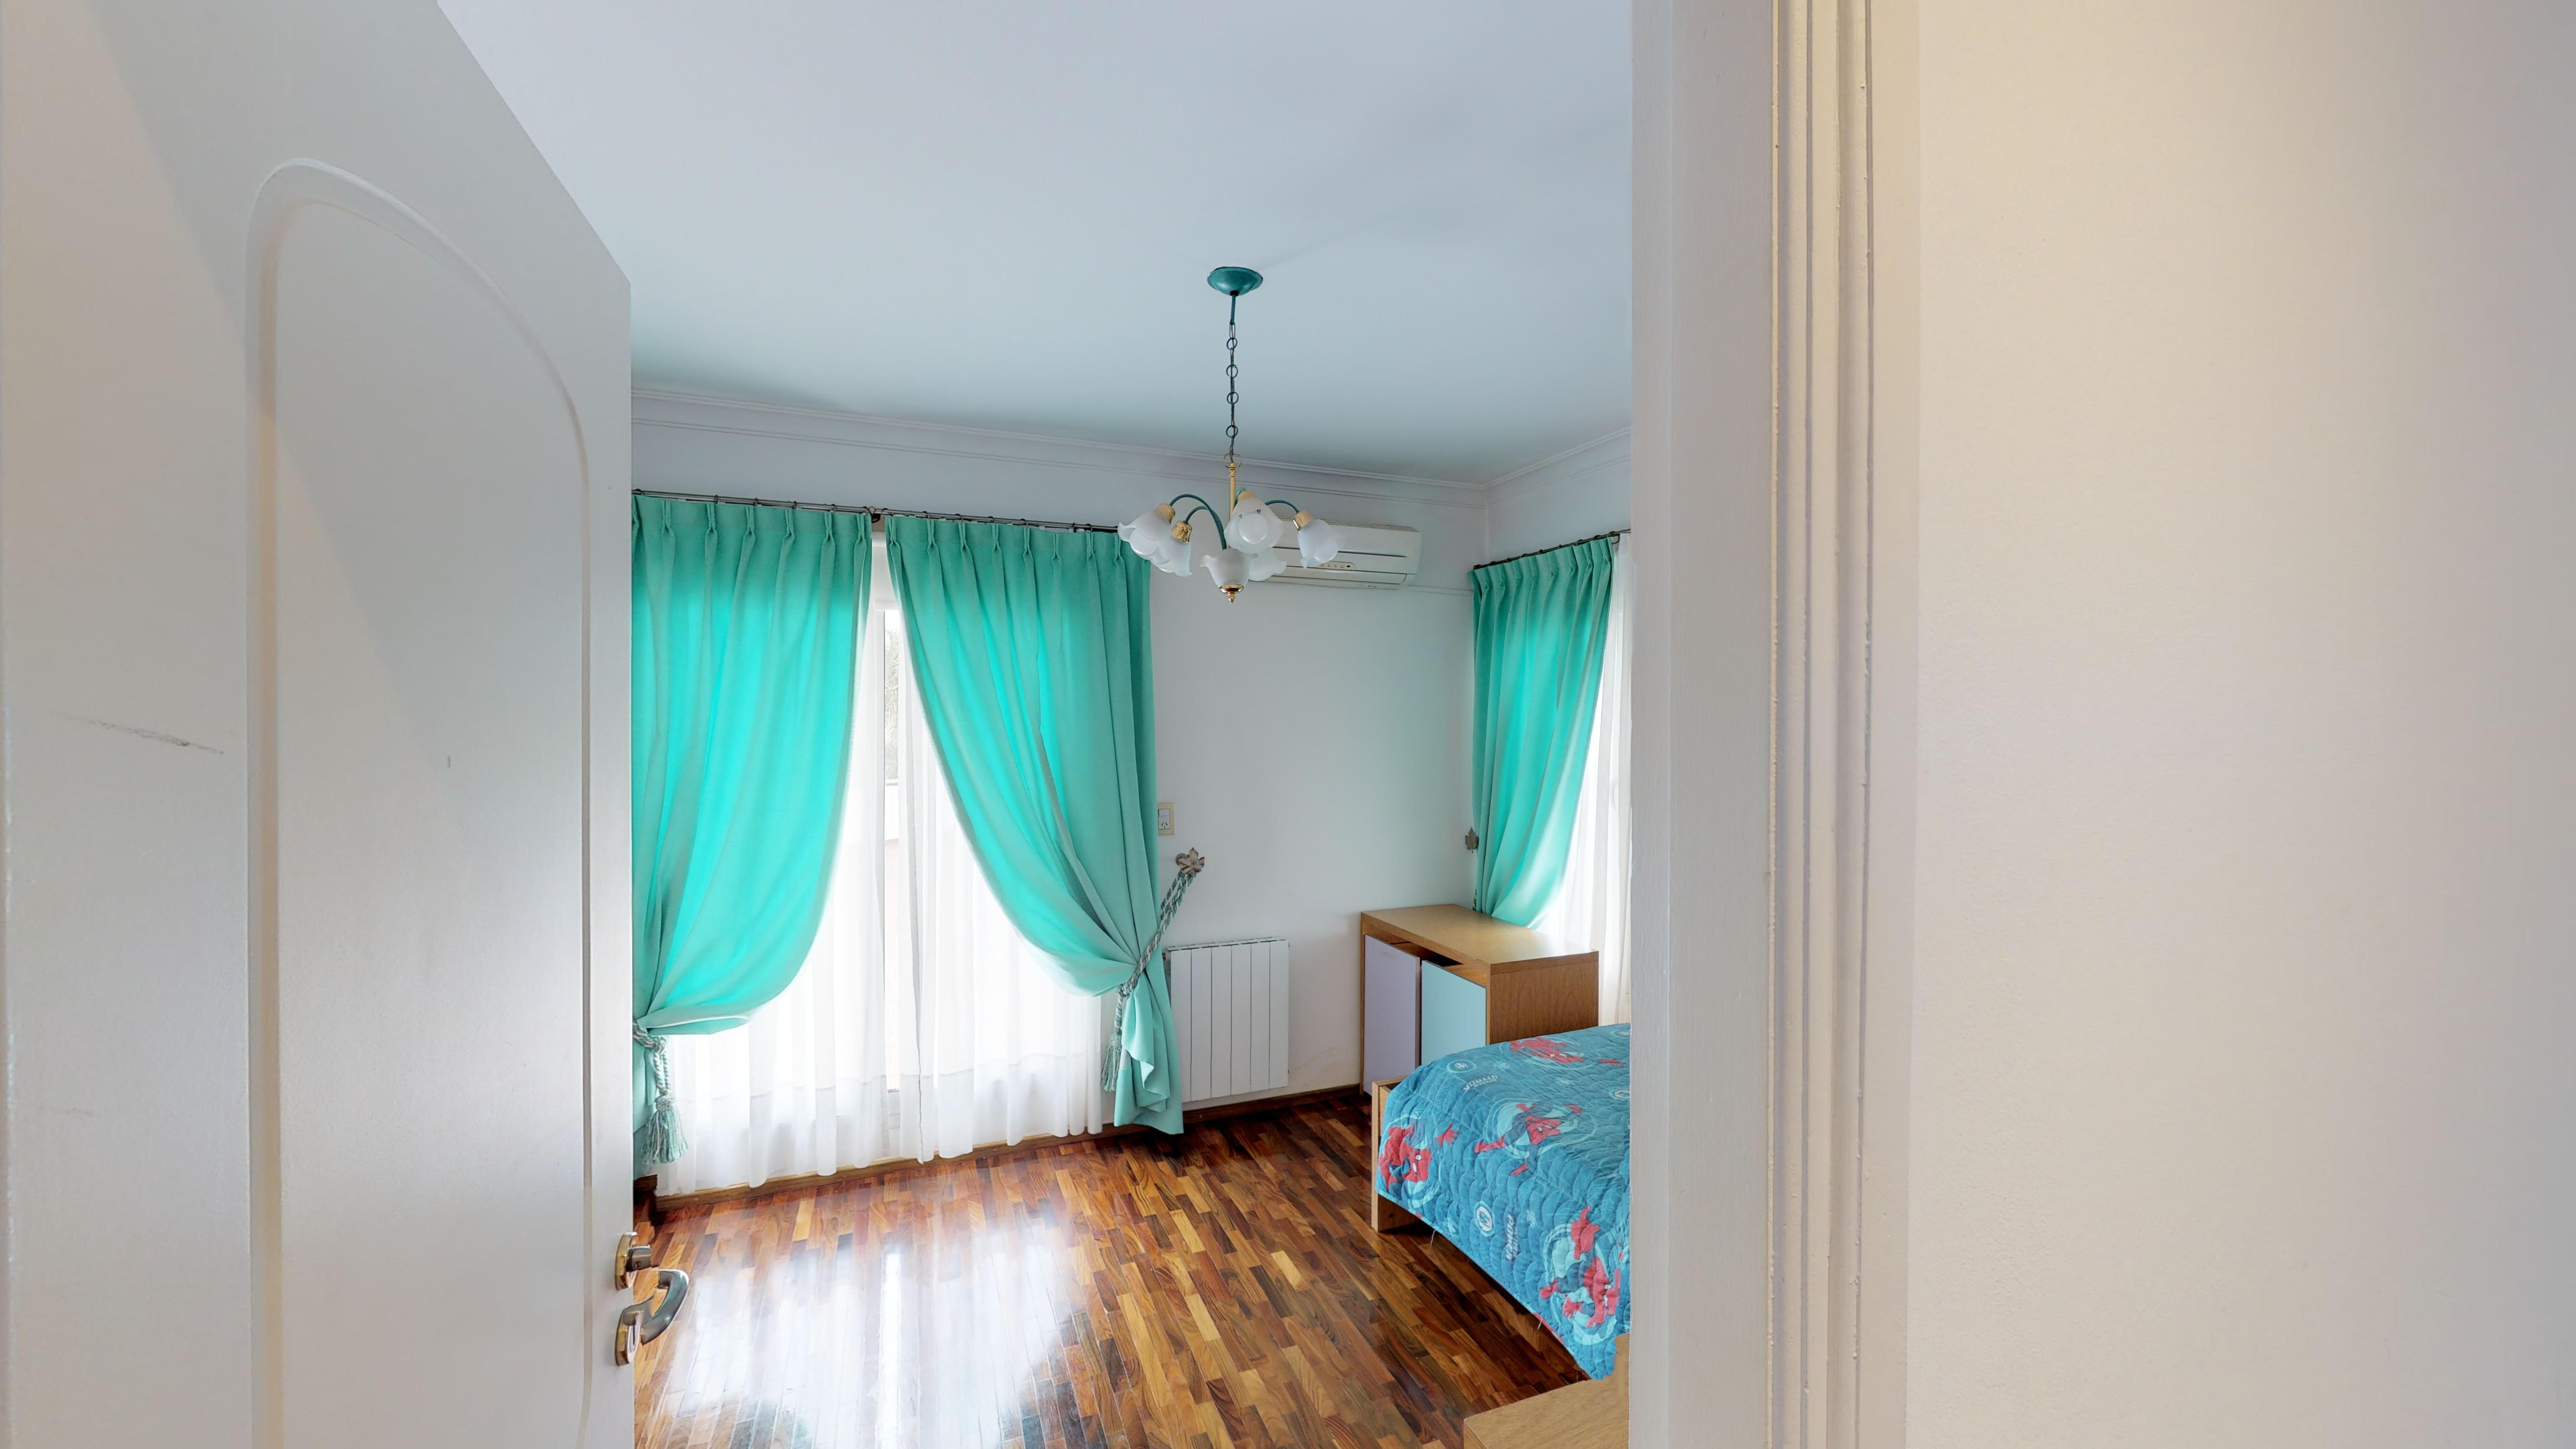 Dormitorio  2 con balcon al frente